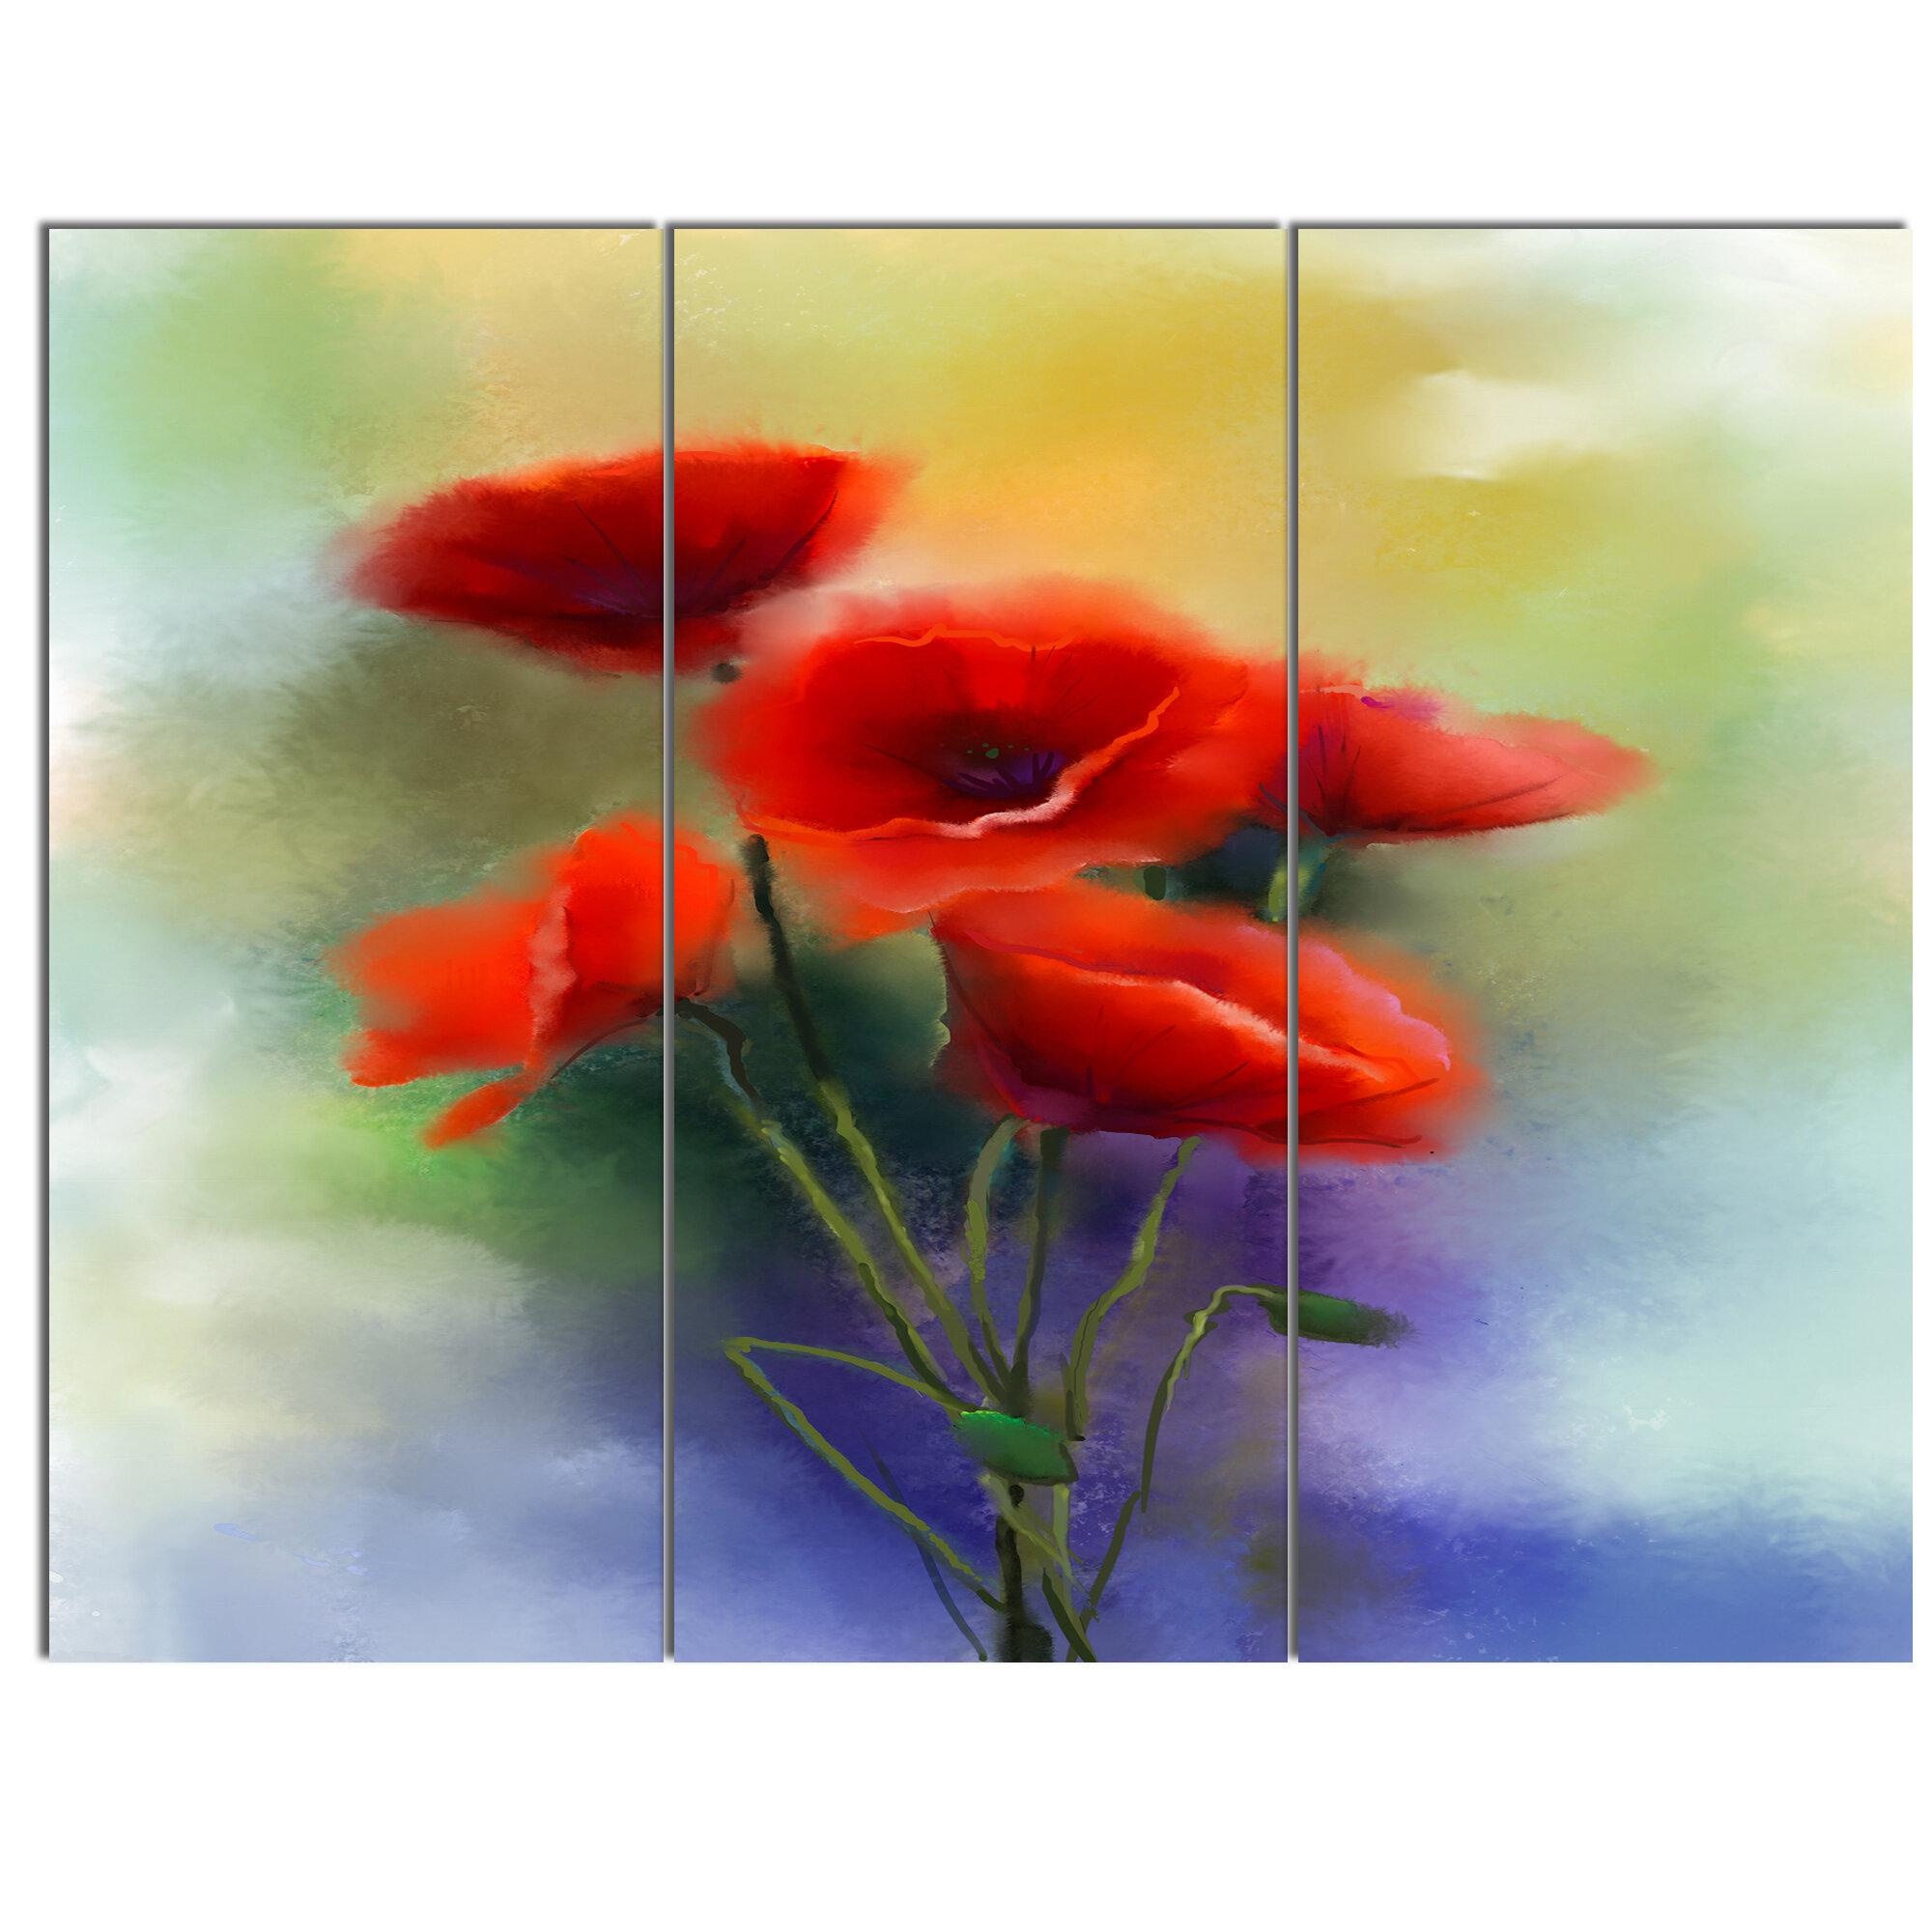 Designart watercolor red poppy flowers painting 3 piece painting designart watercolor red poppy flowers painting 3 piece painting print on metal set wayfair mightylinksfo